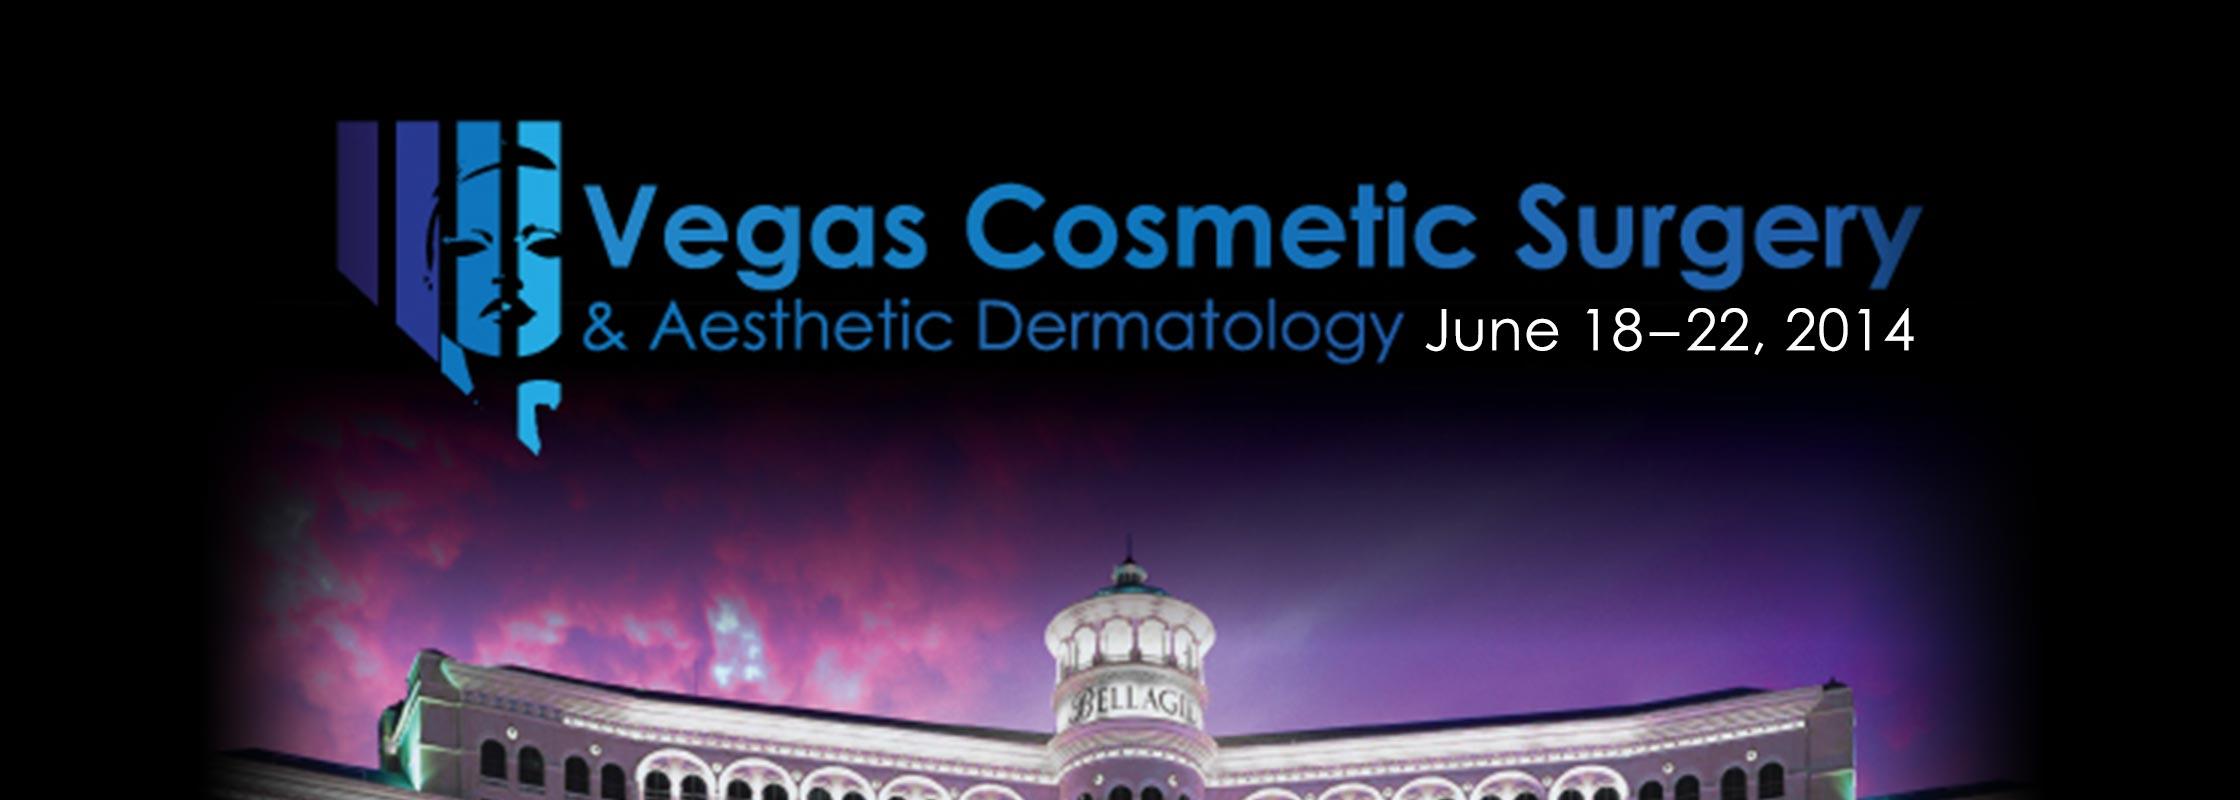 Vegas Cosmetic Surgery & Aesthetic Dermatology June 2014